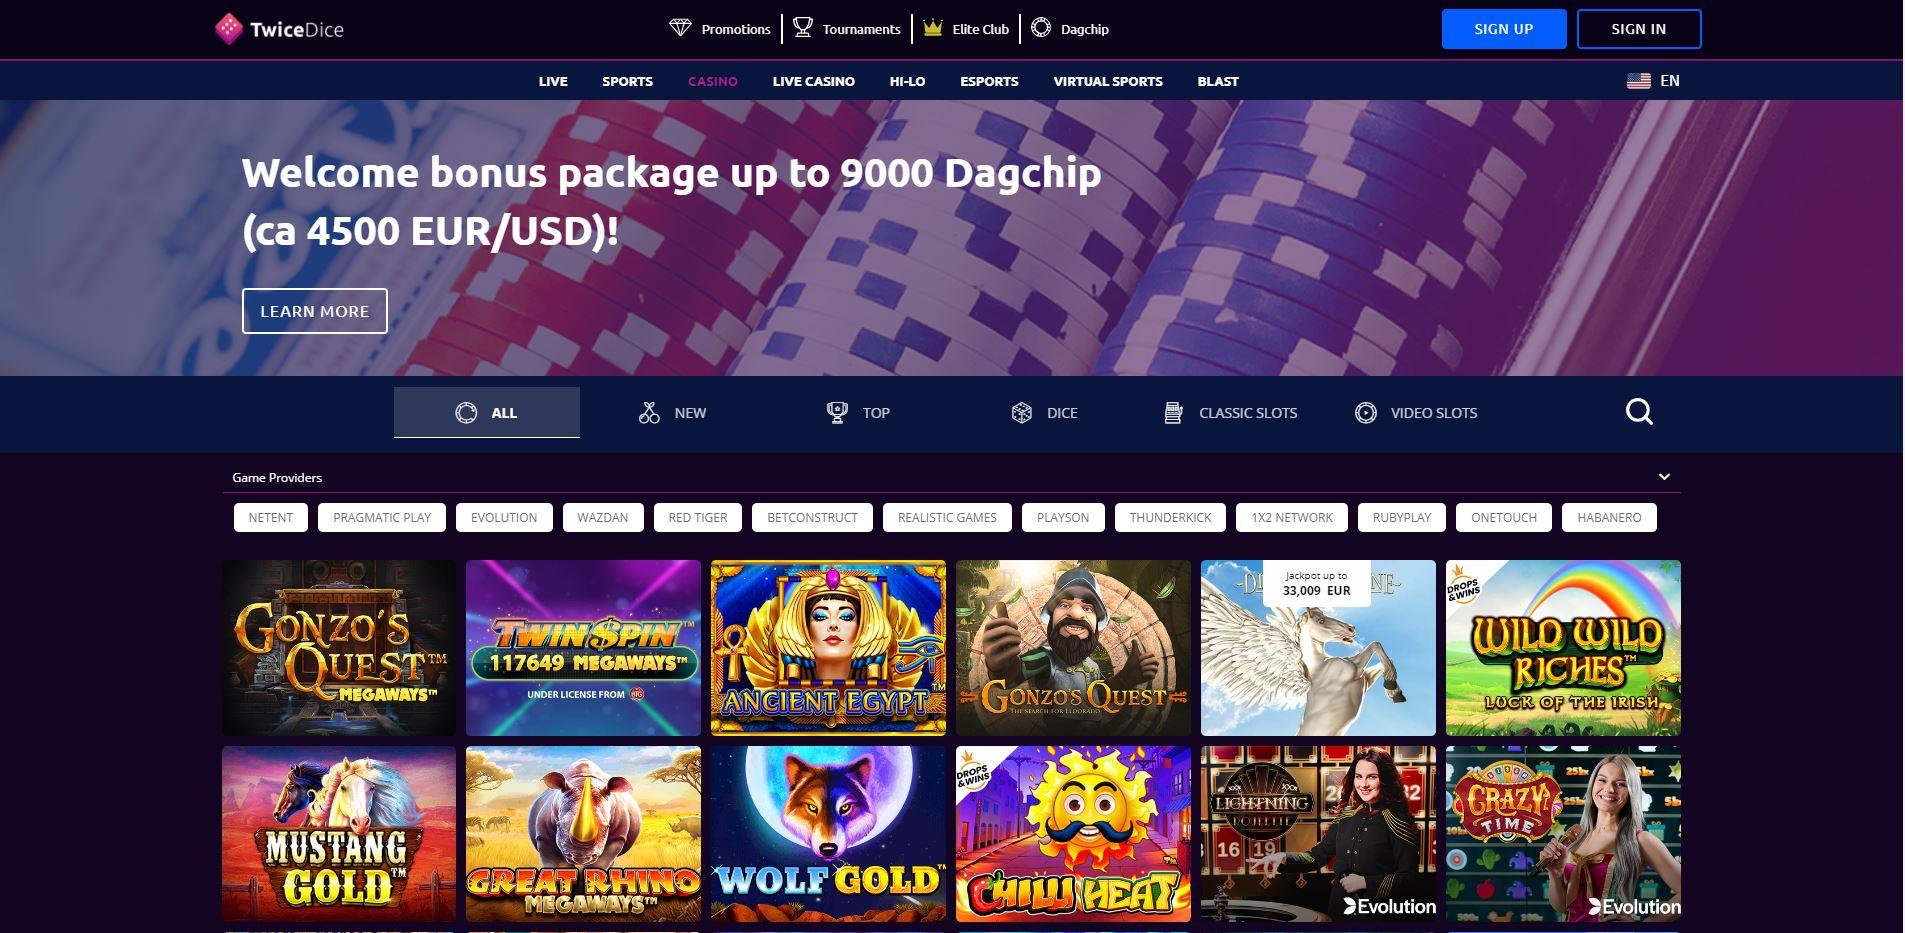 TwiceDice Casino Screenshot